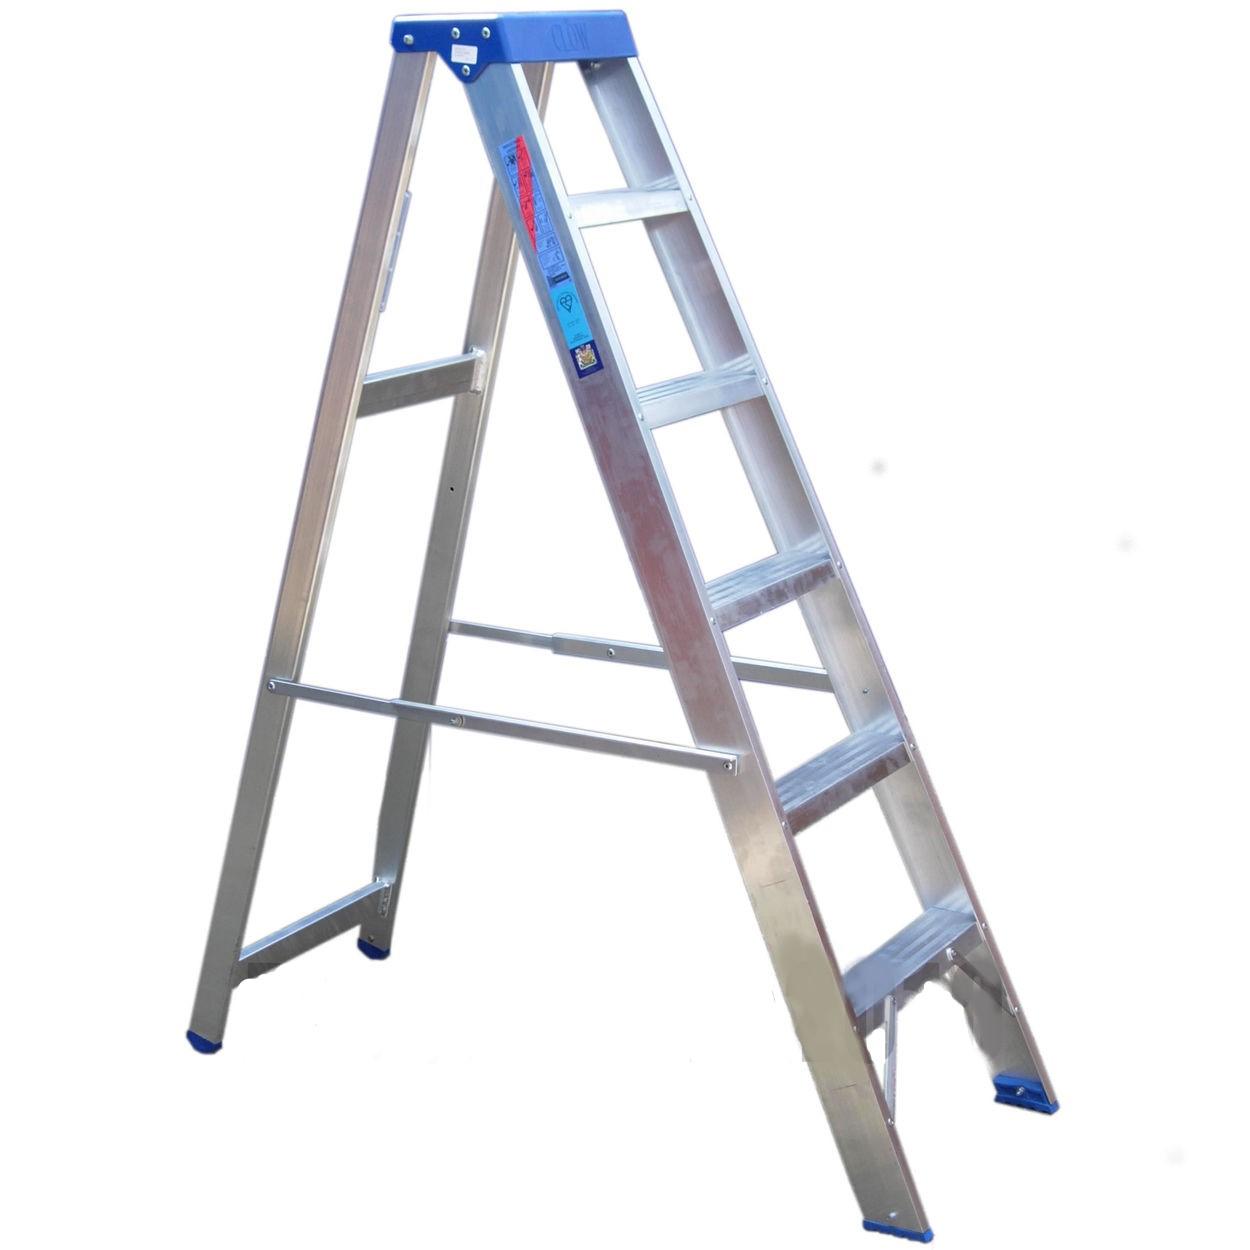 006345 Aluminium platform step